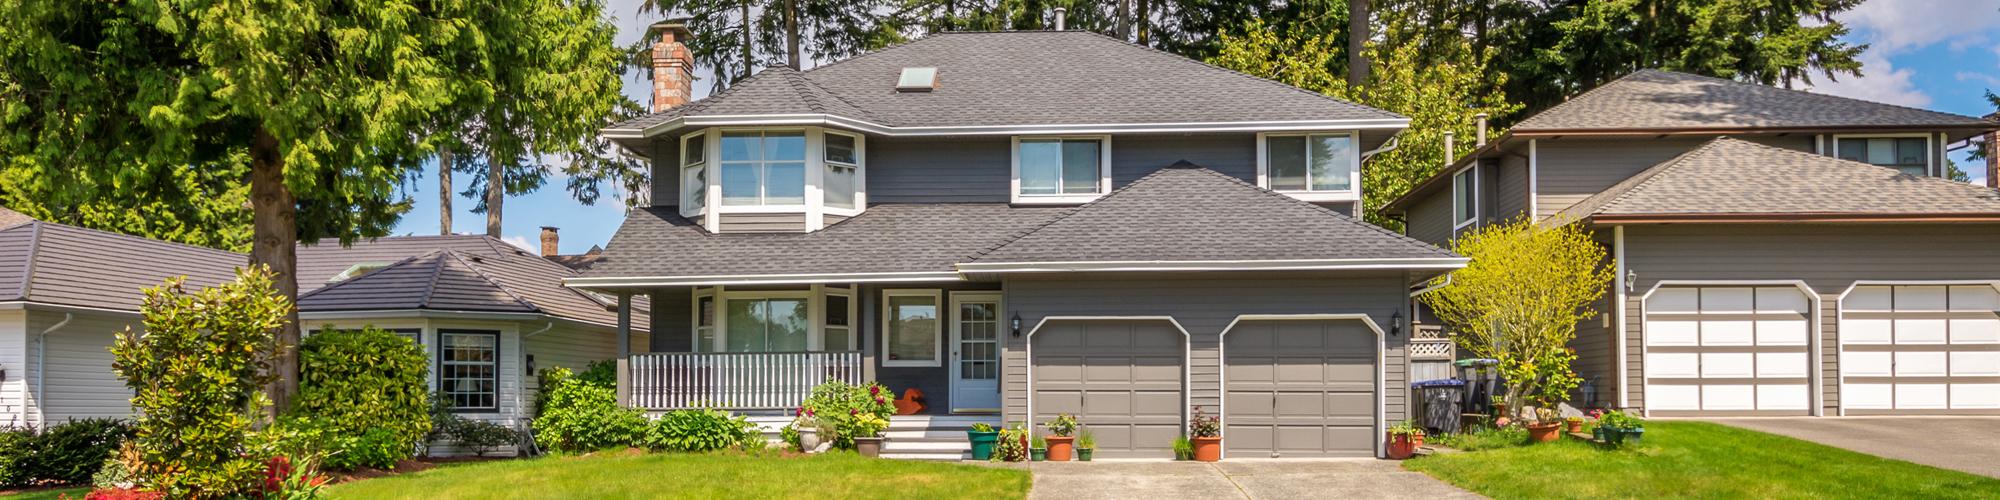 Property Value House Price Estimate Port St Lucie Fl